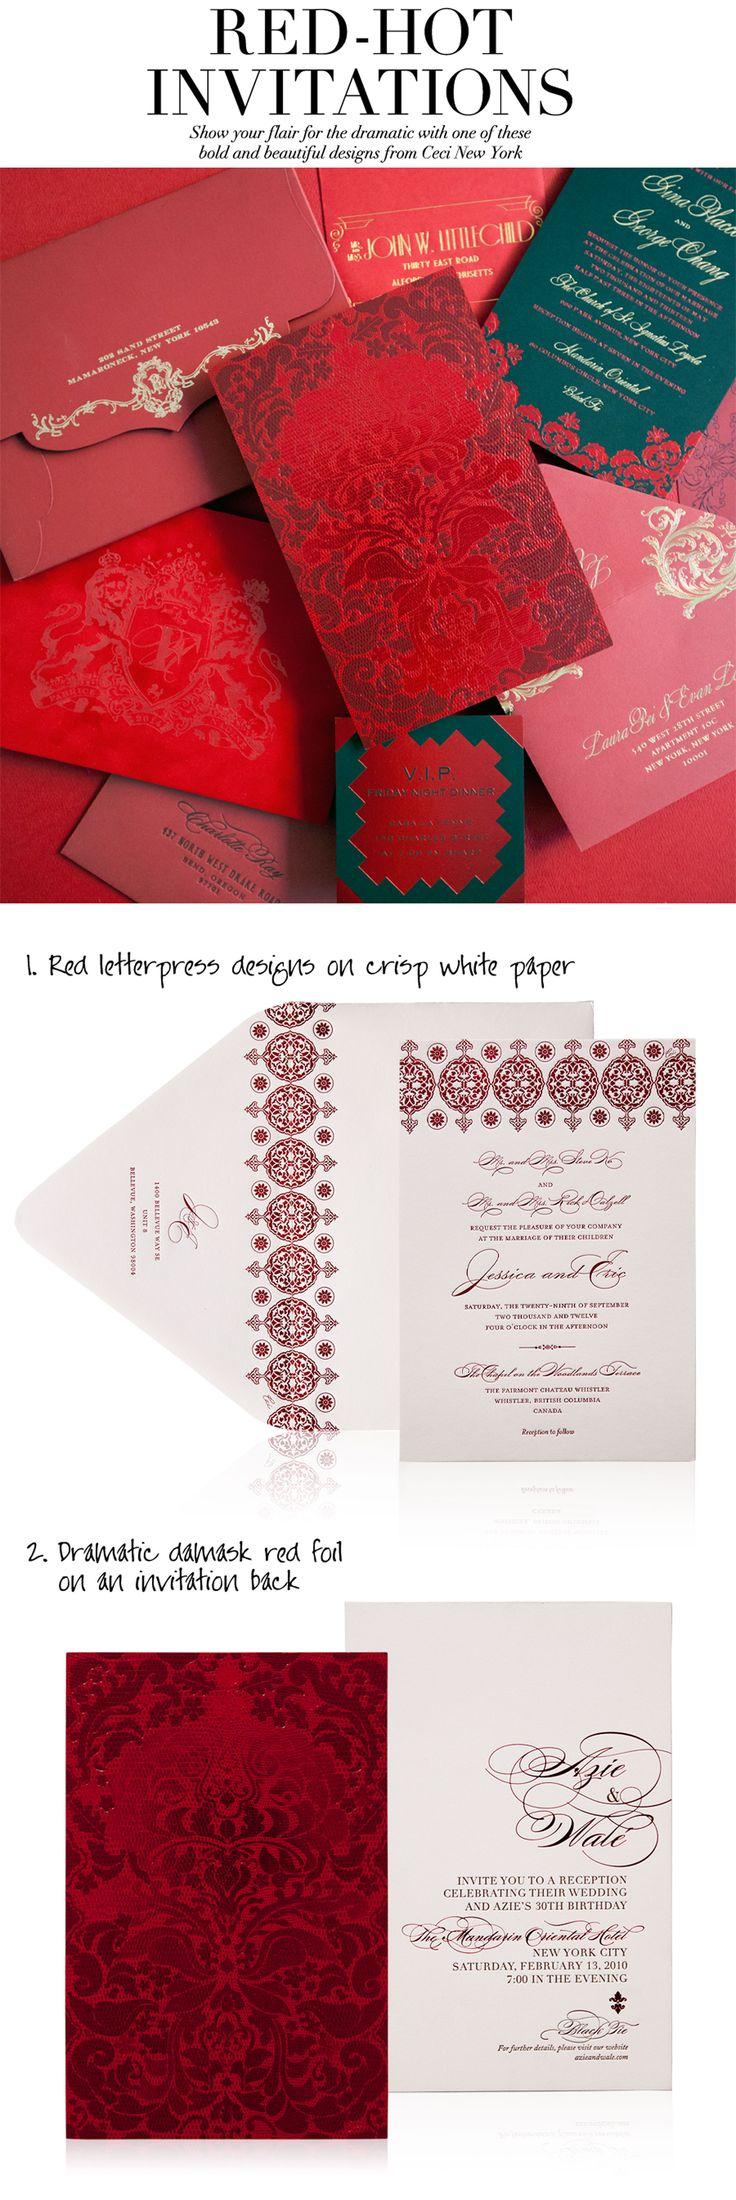 102 best Party & Wedding Invites images on Pinterest | Wedding ...